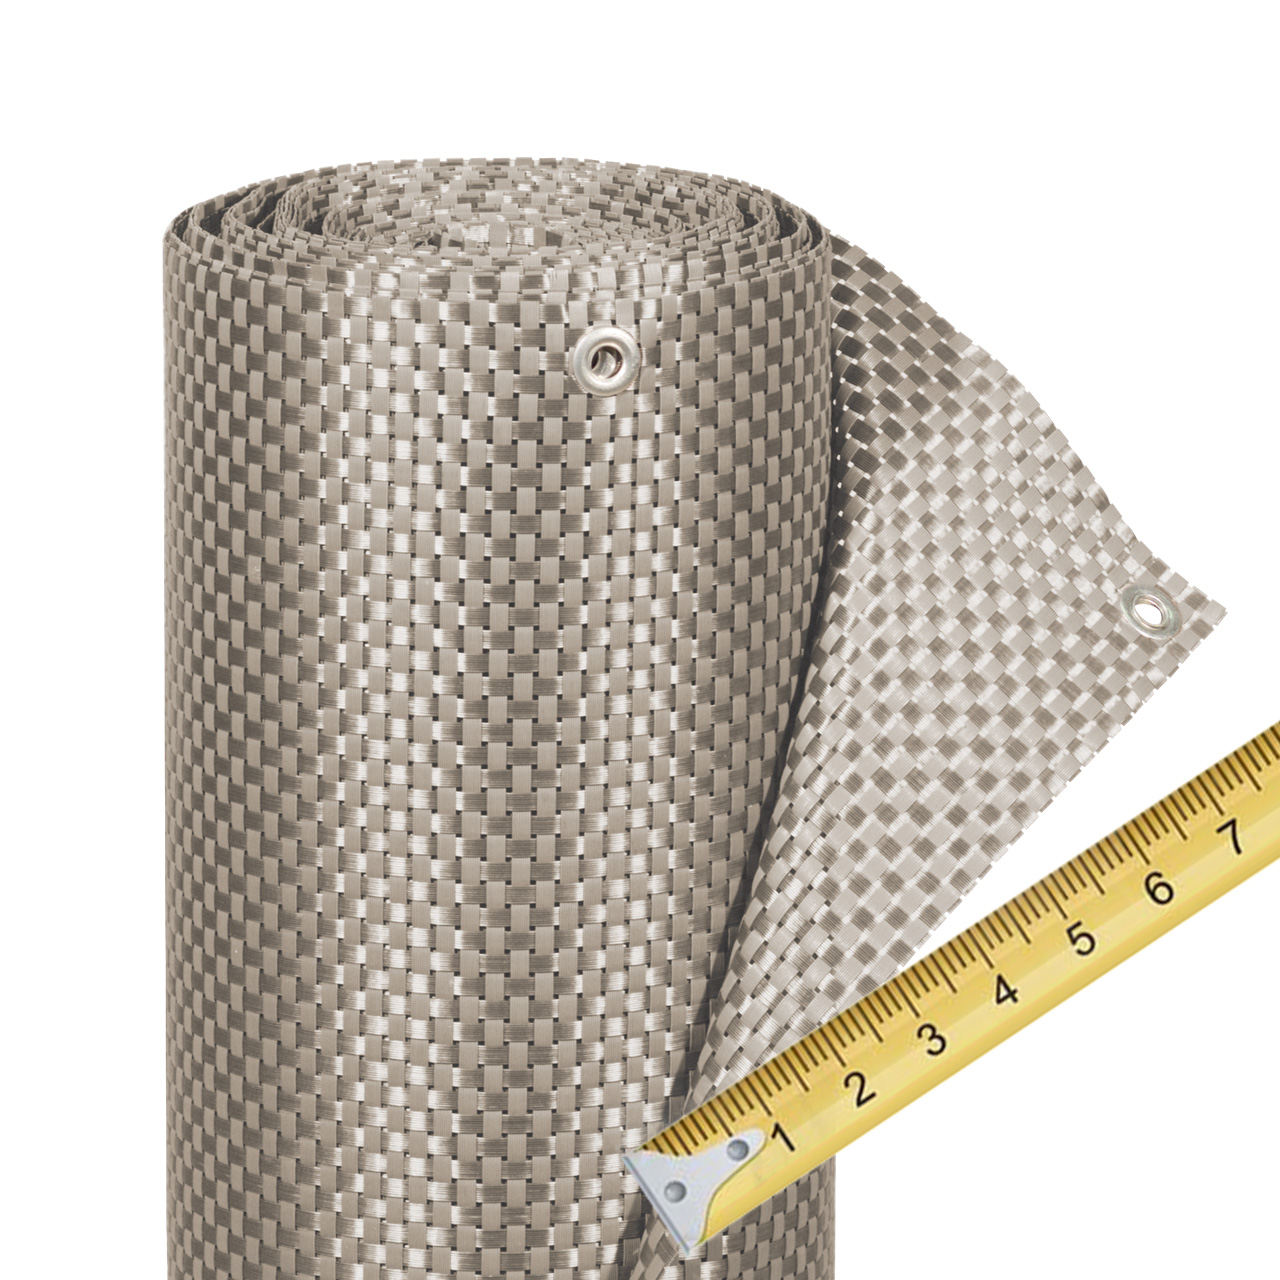 balkonverkleidung kunststoffgeflecht meterware platin sichtschutz. Black Bedroom Furniture Sets. Home Design Ideas